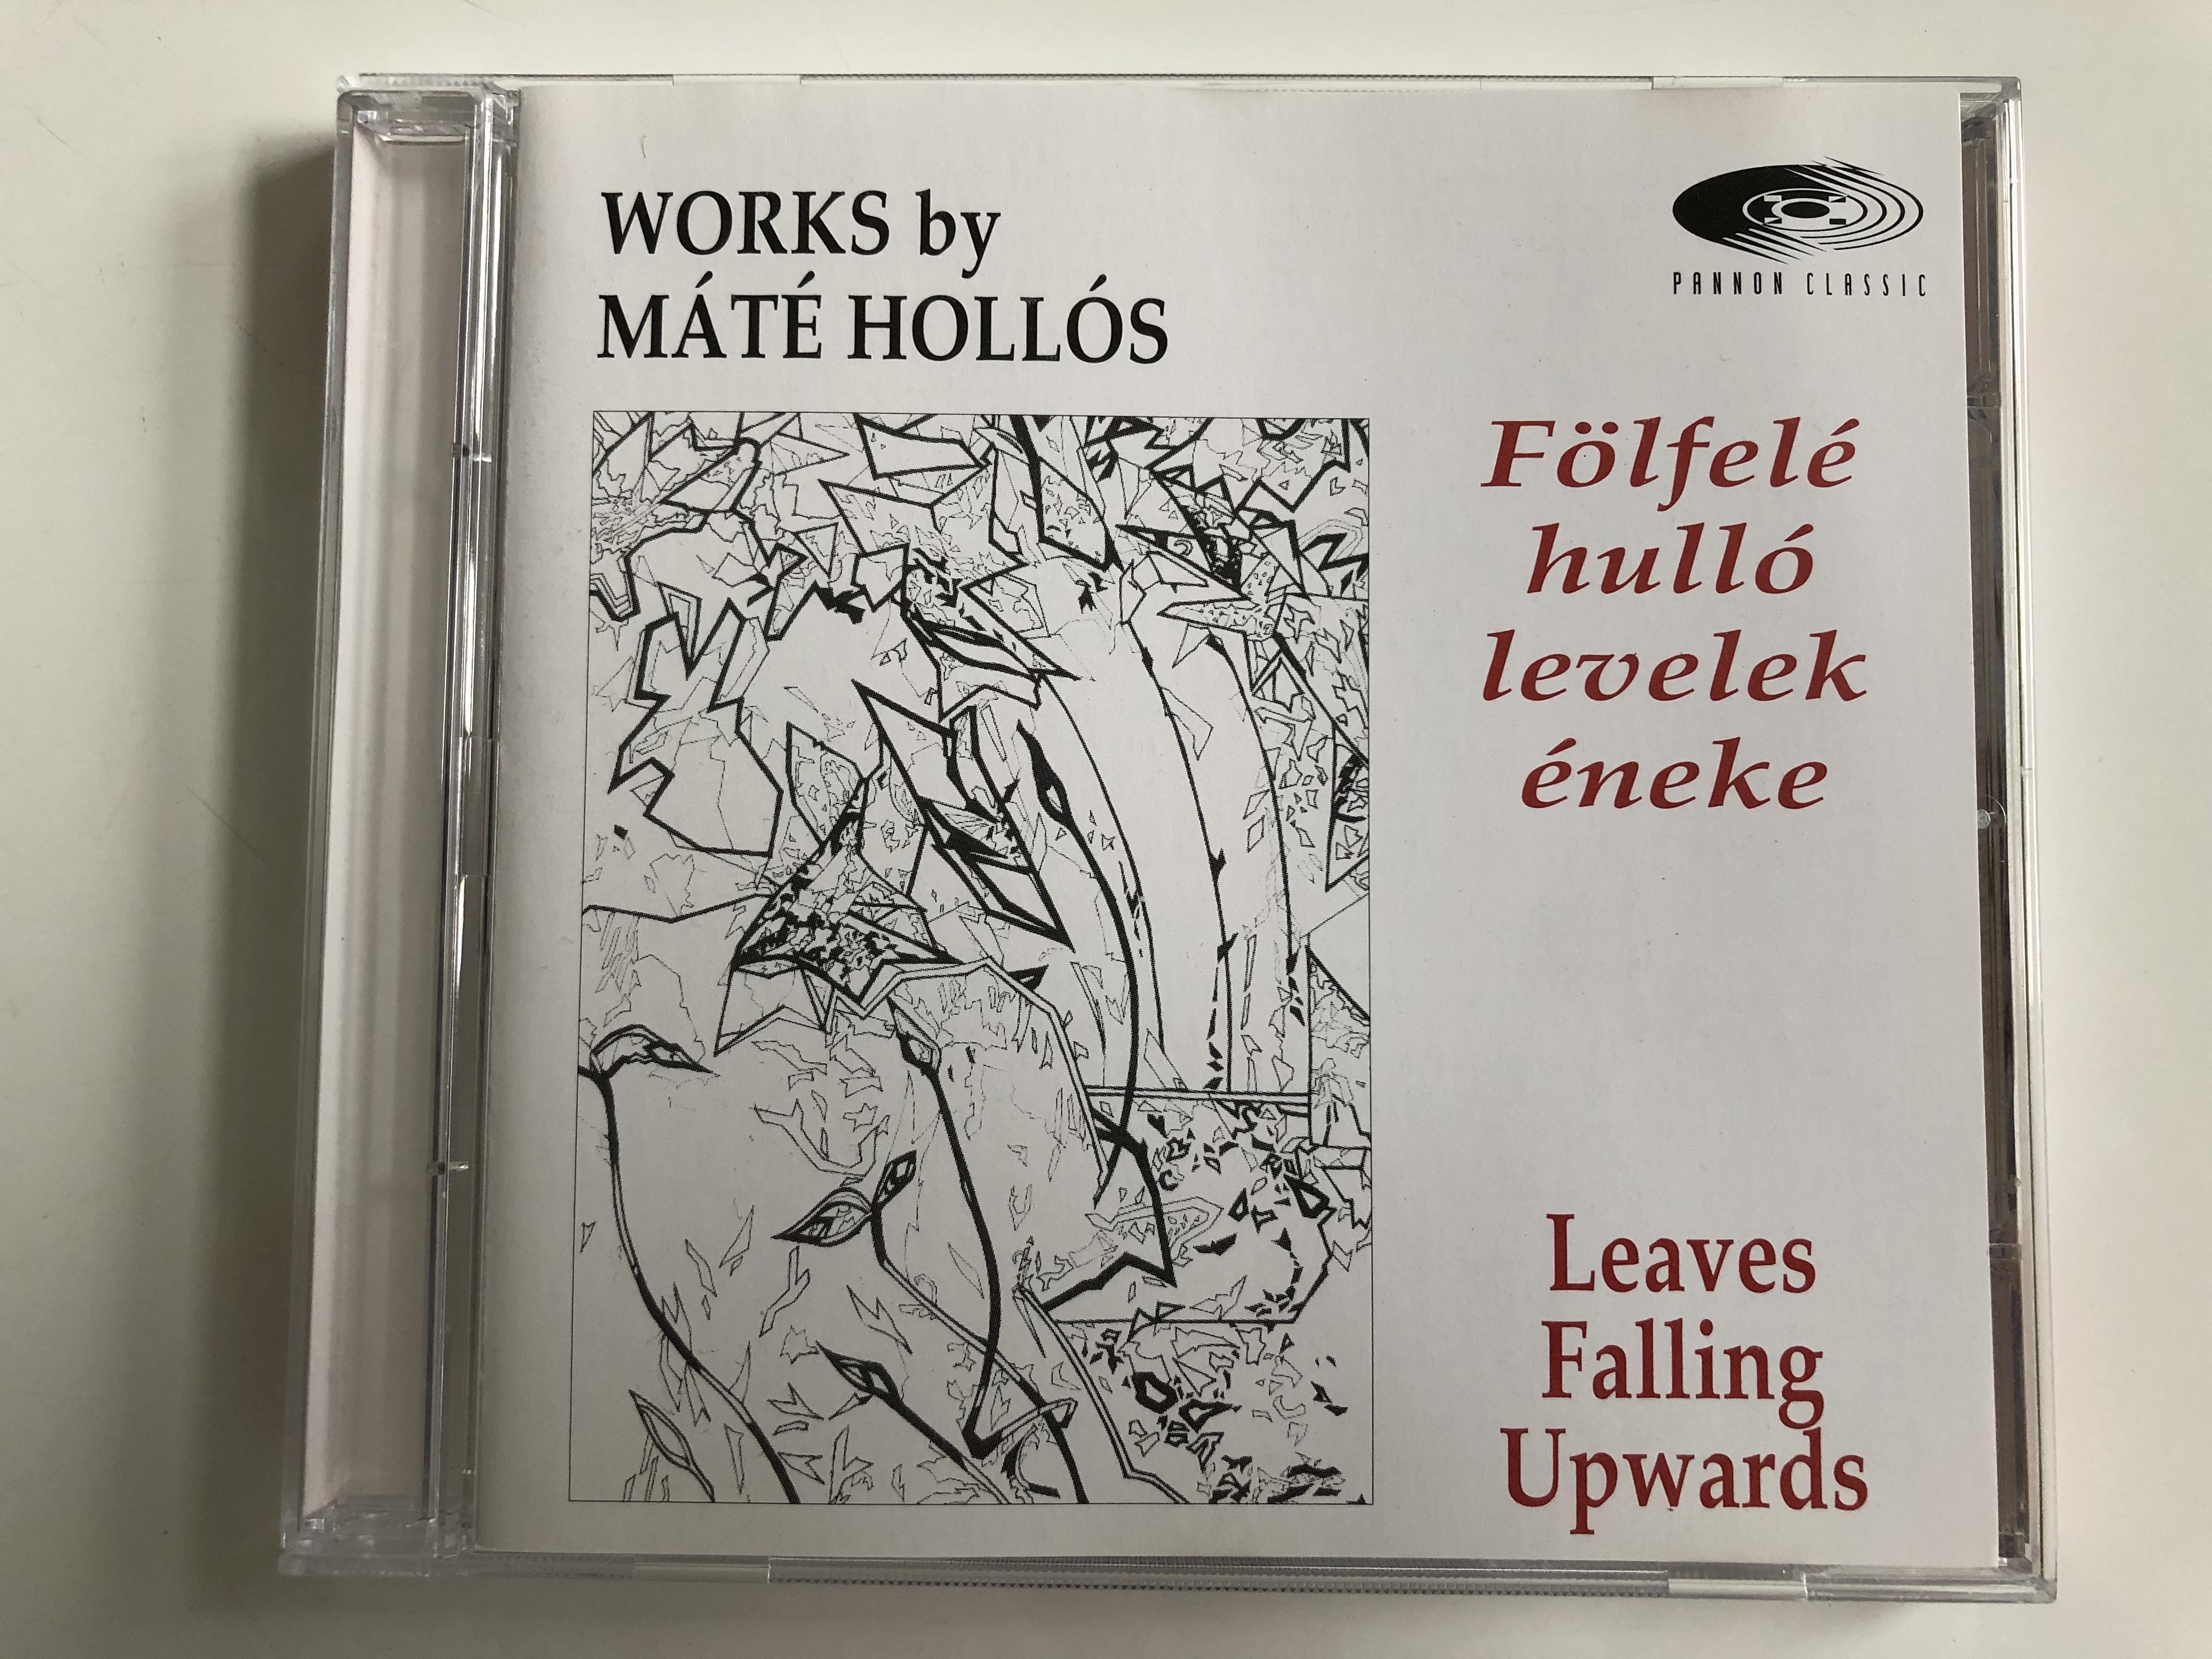 works-by-mate-hollos-folfele-hullo-levelek-eneke-leaves-falling-upwards-pannon-classic-audio-cd-1997-pcl-8006-1-.jpg